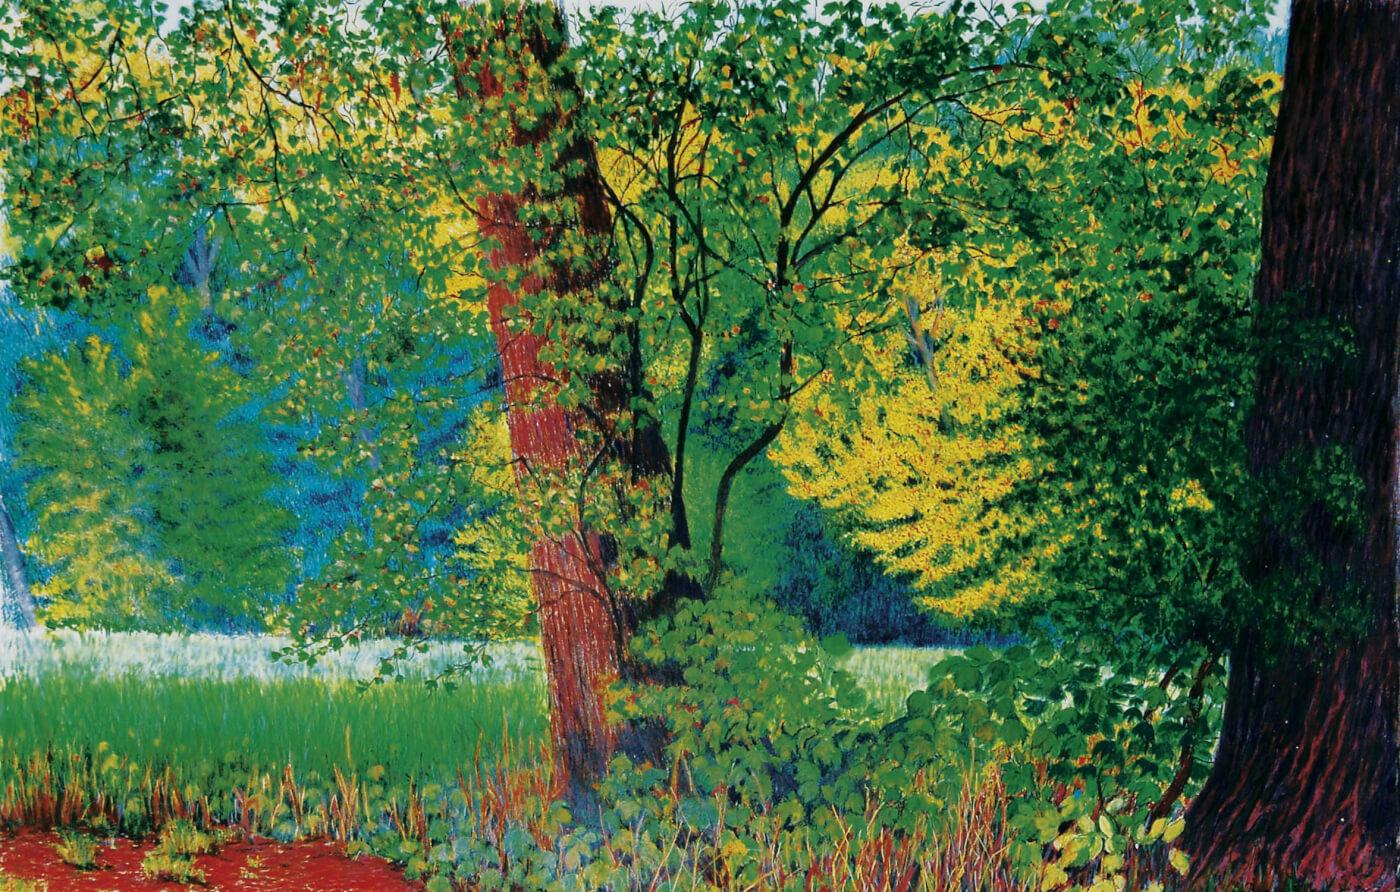 Natur, Malerei, Sommerbild, painting, Tempera, Hamburg, Jenisch Park